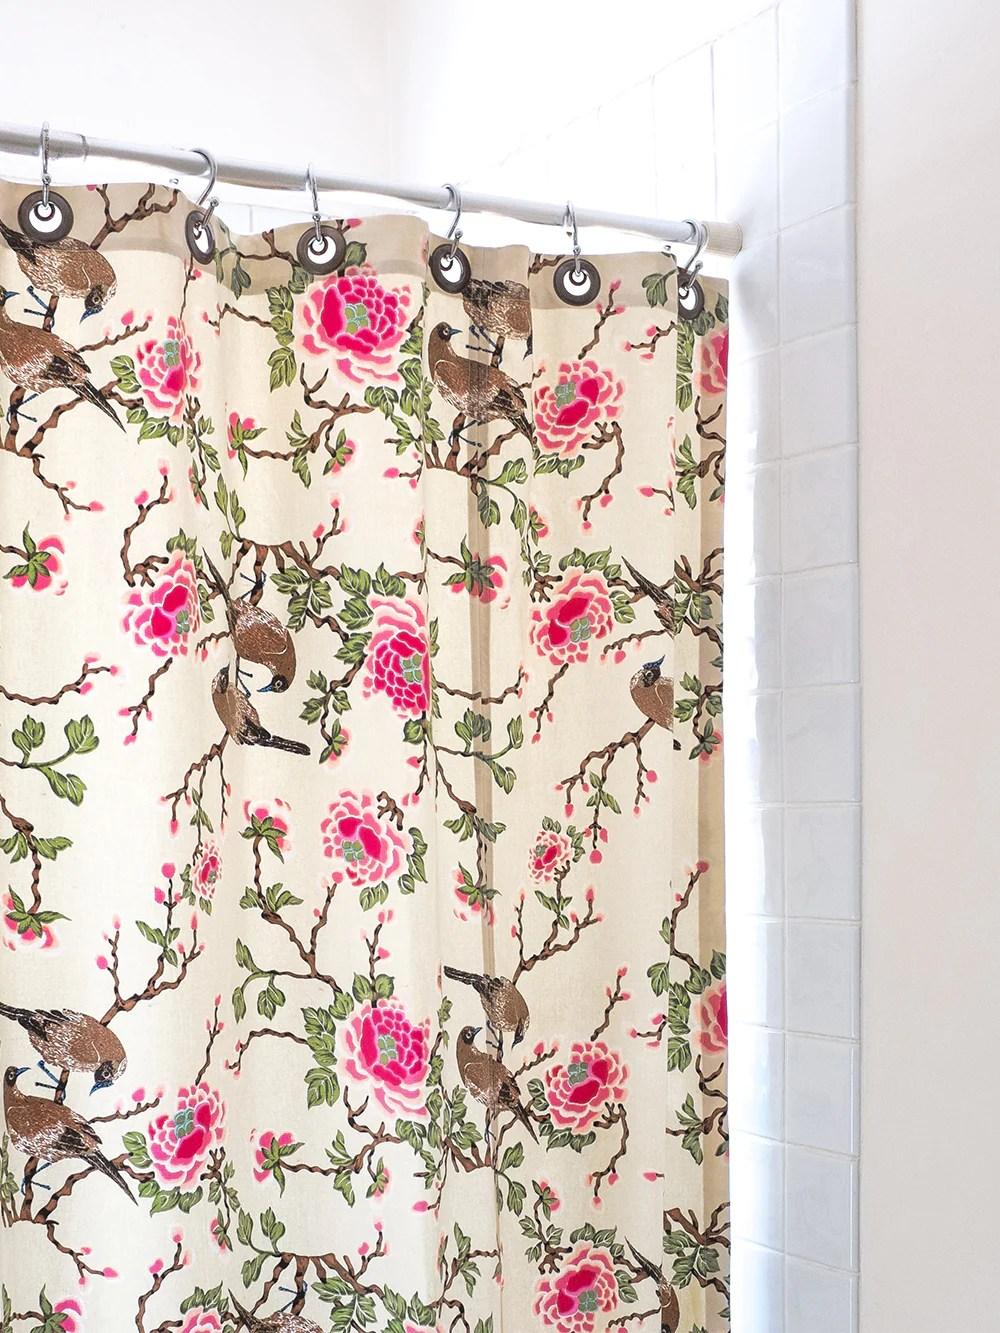 Lovebird Shower Curtain In Natural